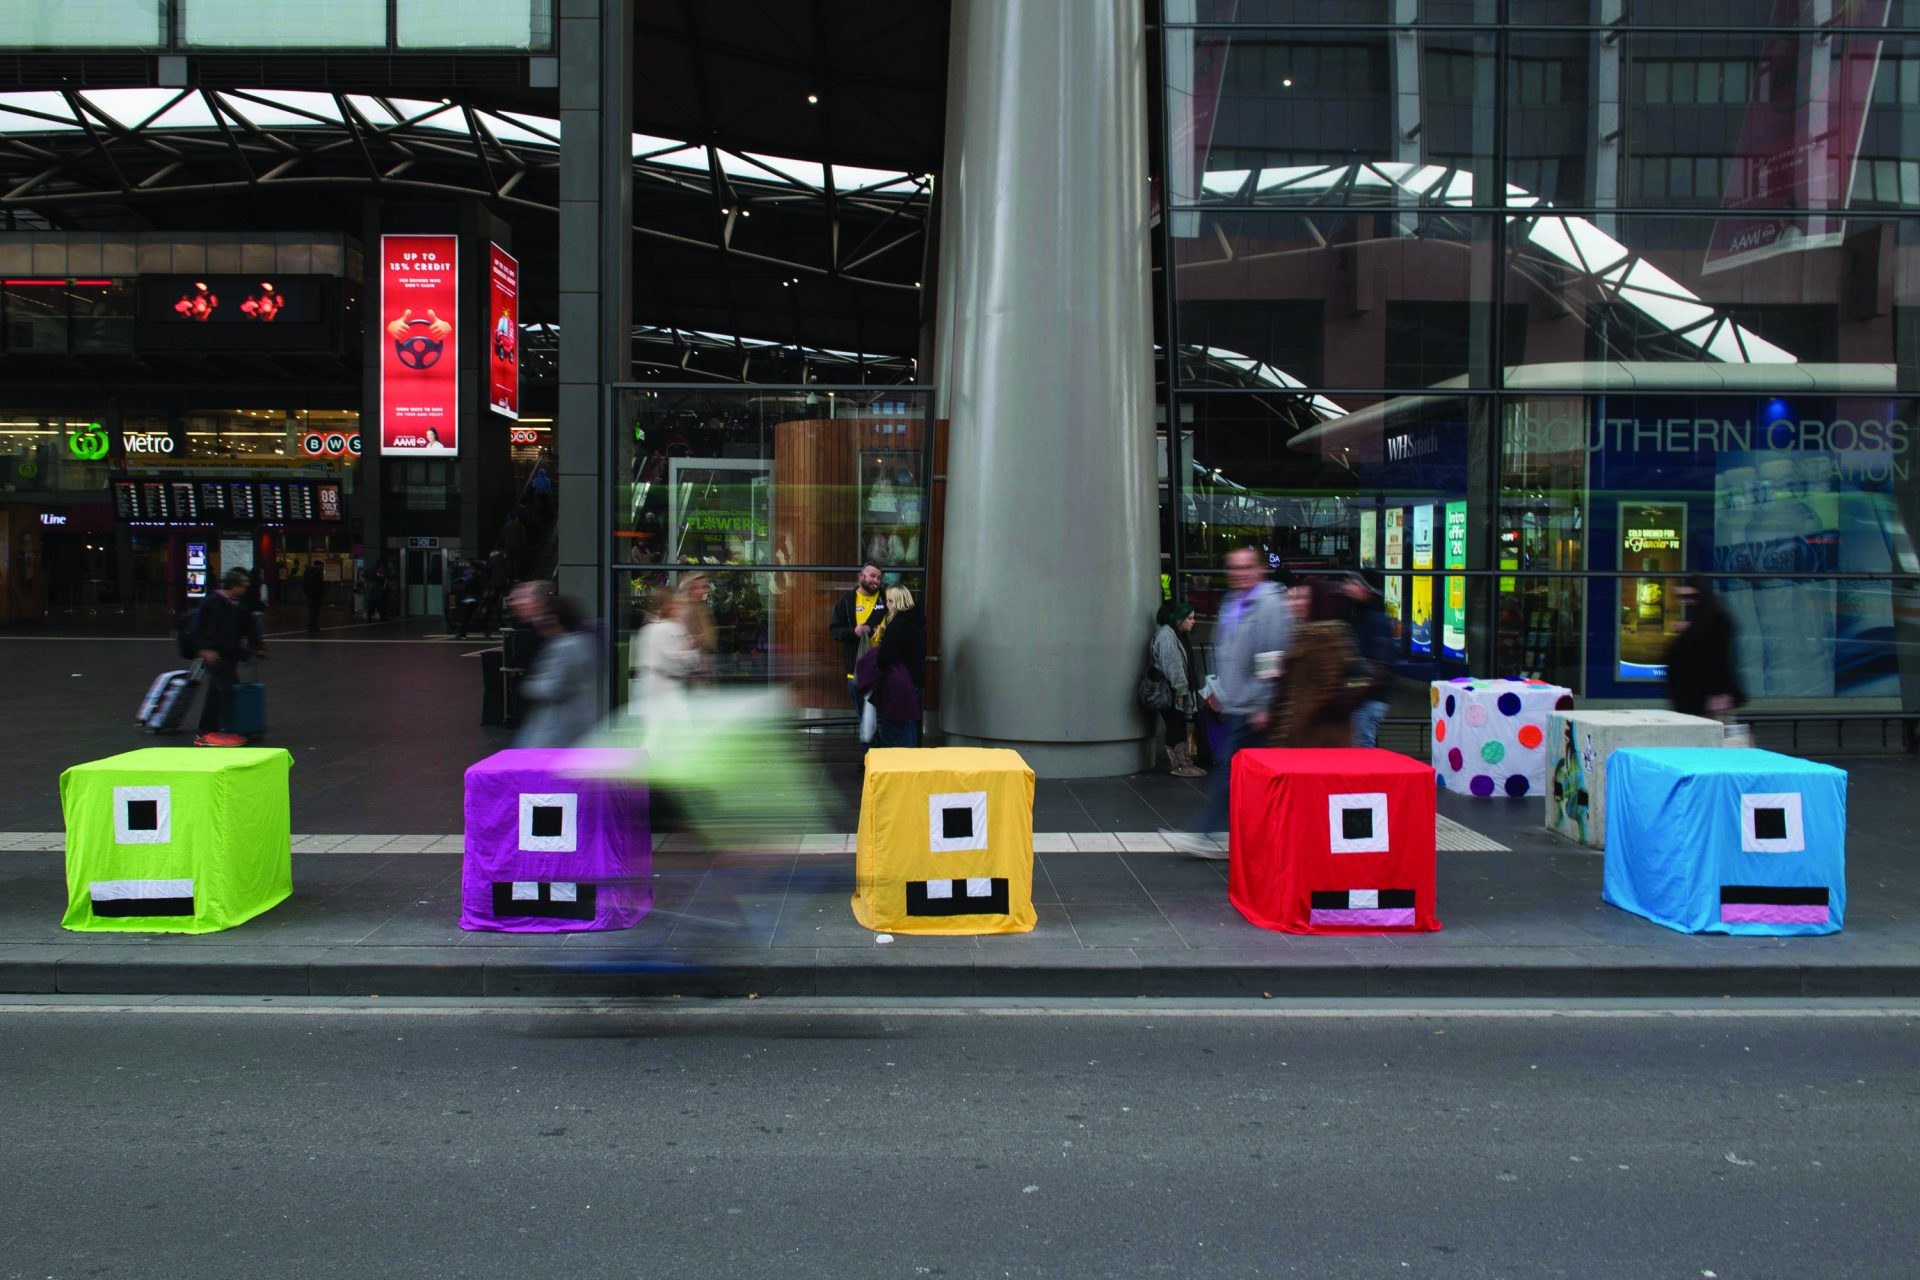 concrete bollards were installed throughout central Melbourne